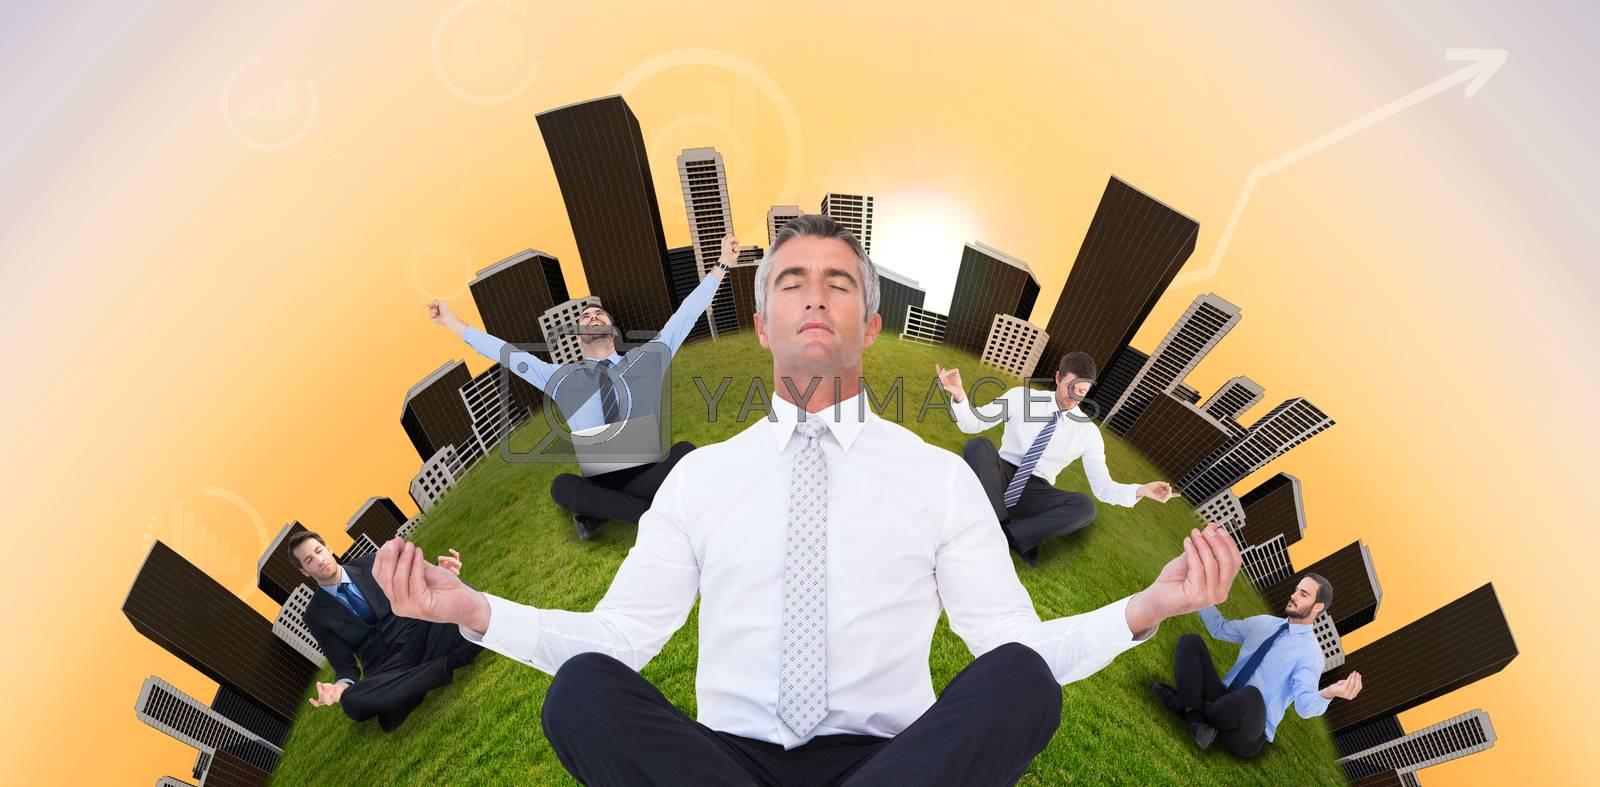 Zen businessman meditating in lotus pose  against purple and orange sky